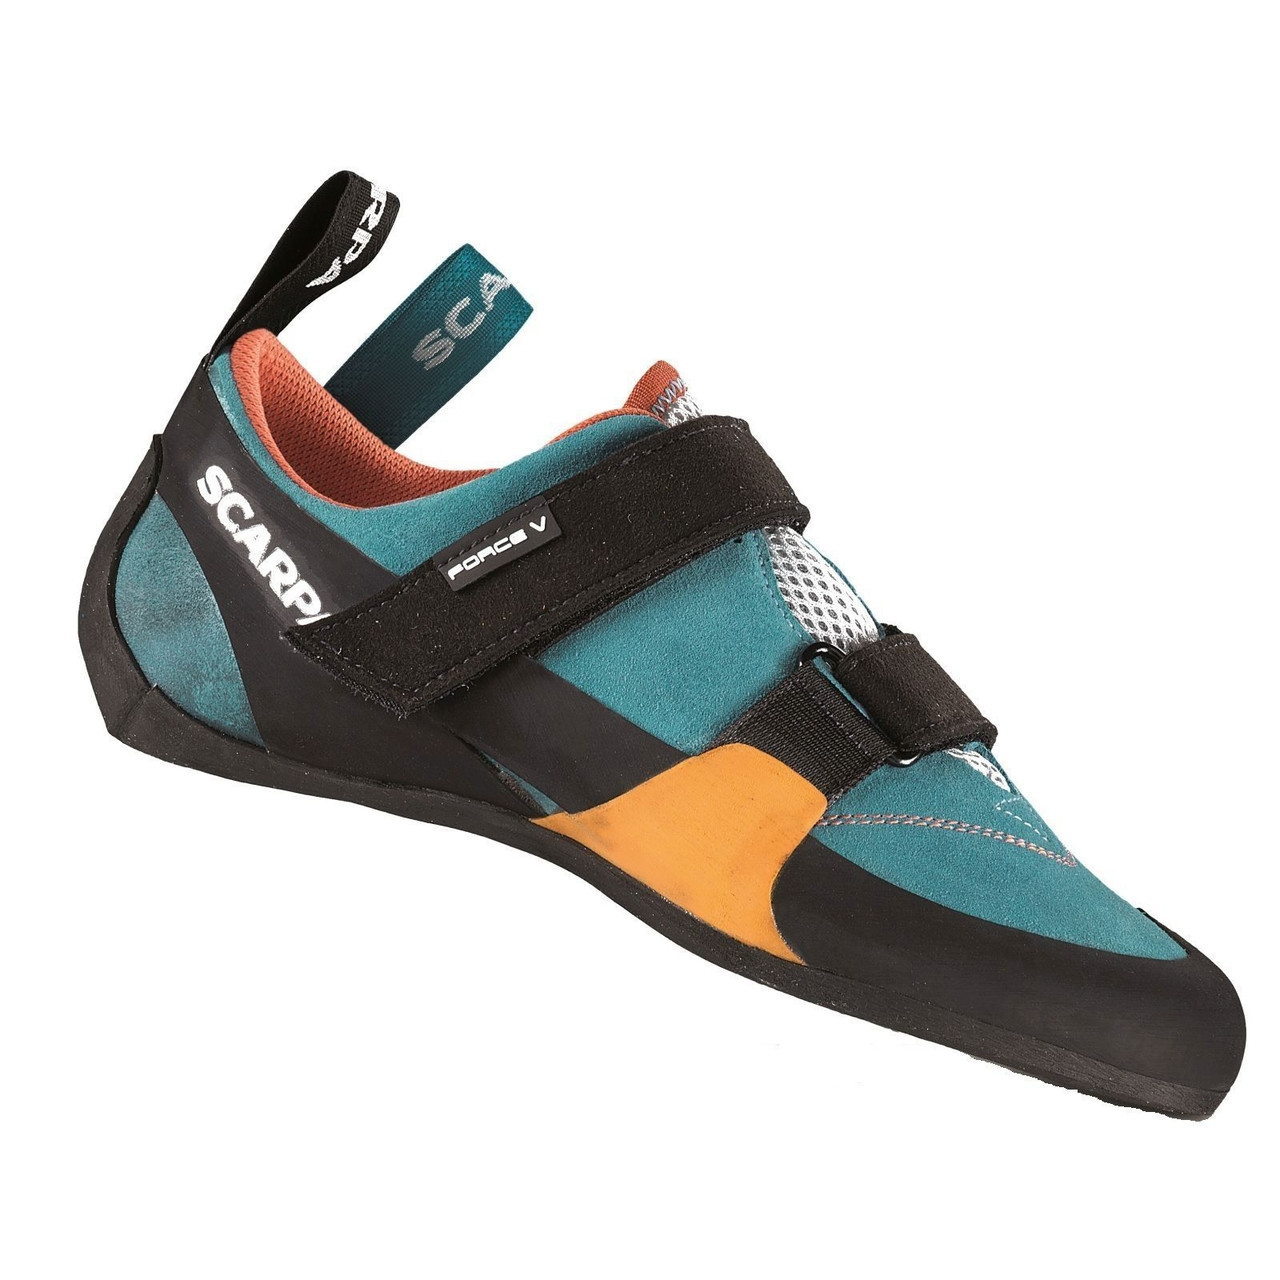 Maldive//Black SCARPA Womens Origin Rock Climbing Shoes 7-7.5